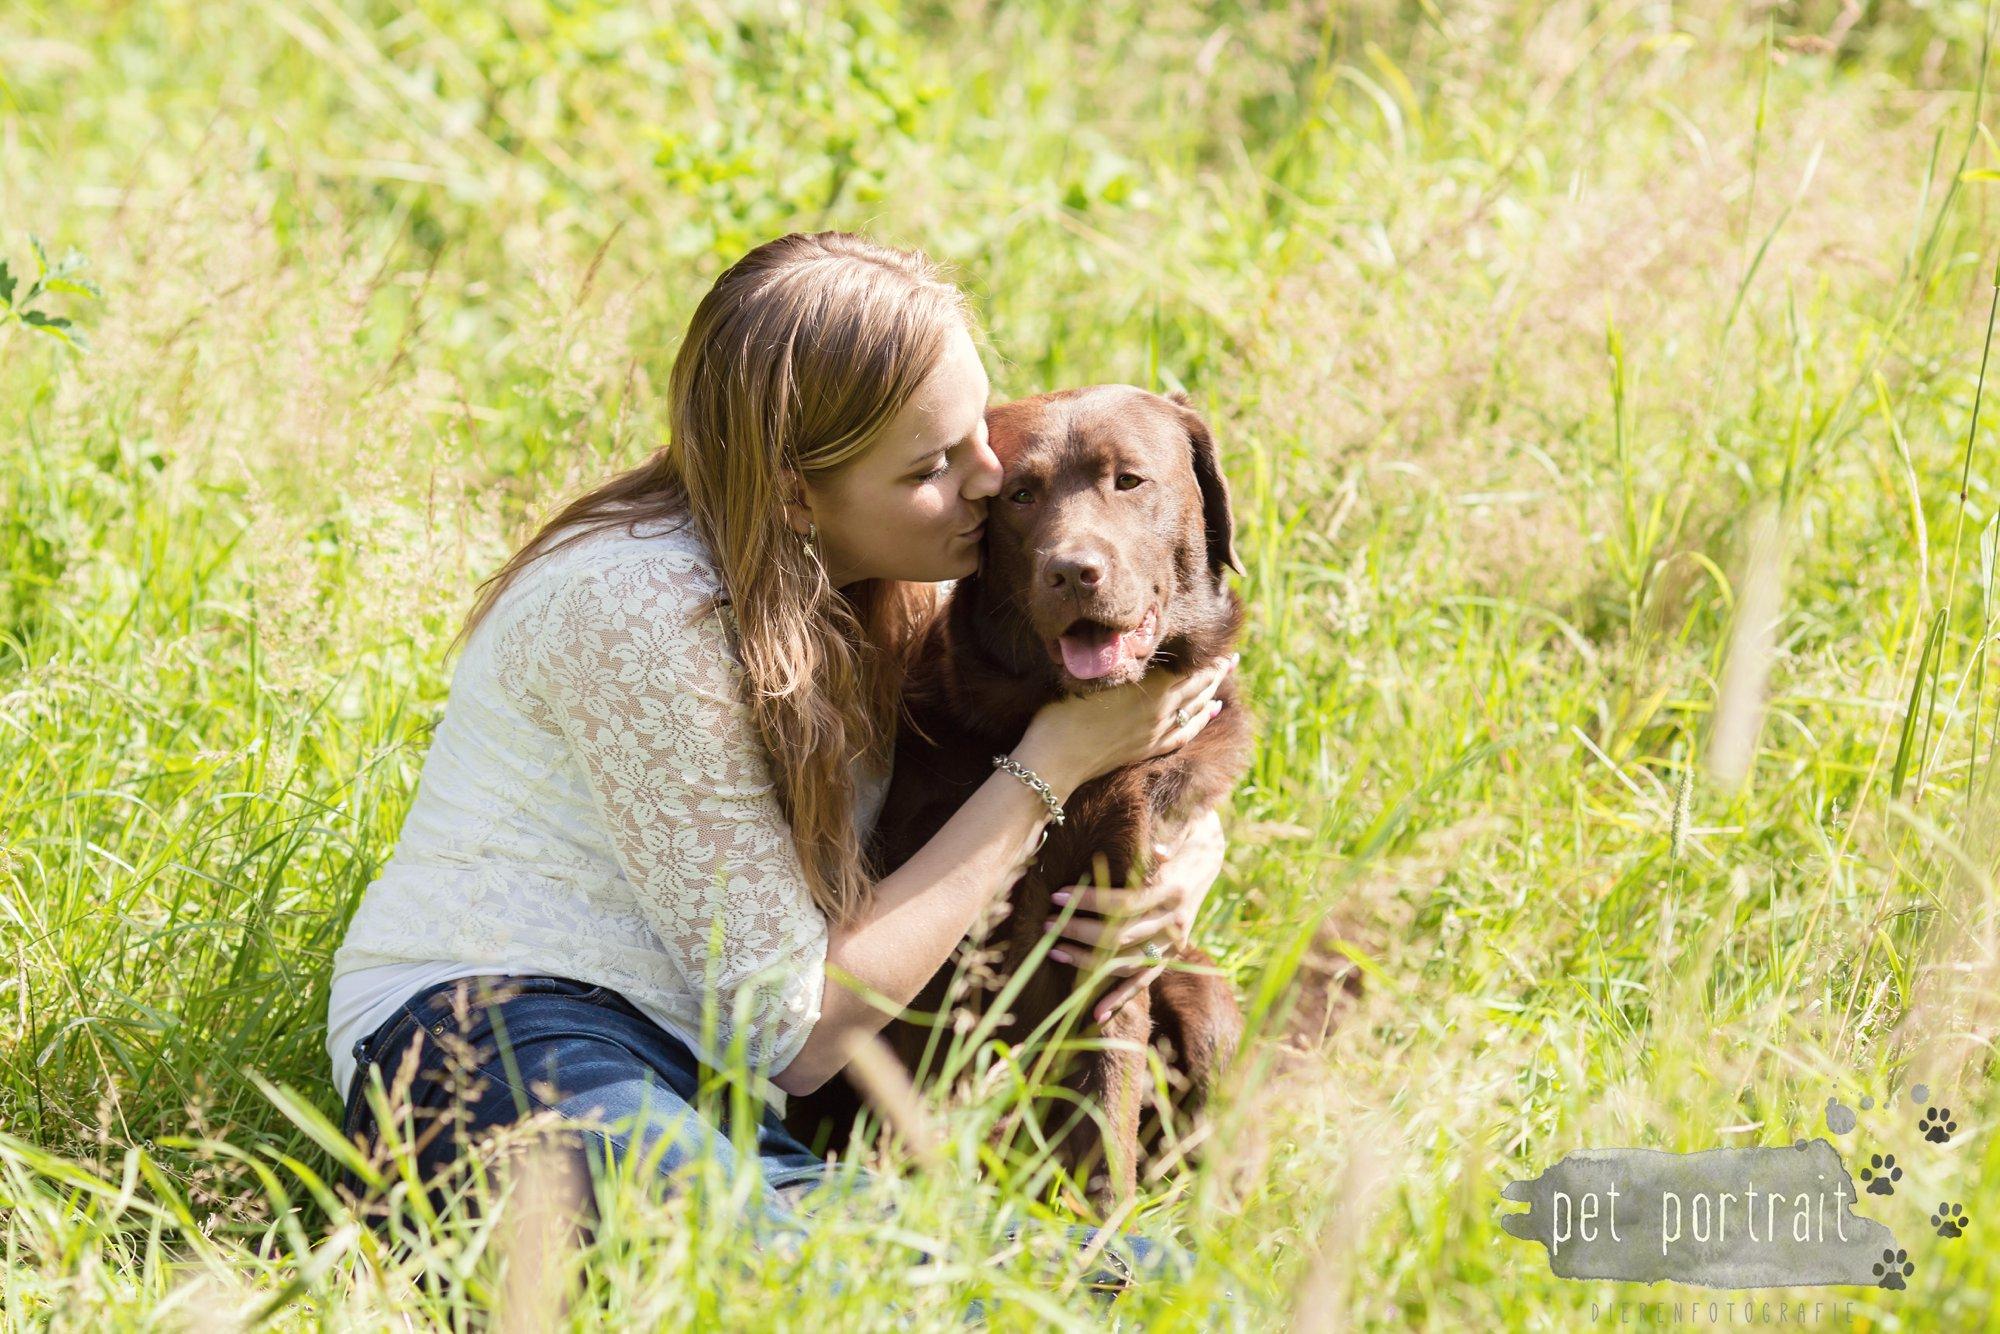 Hondenfotograaf Lelystad - Beloved Dier en Baasje fotoshoot-6